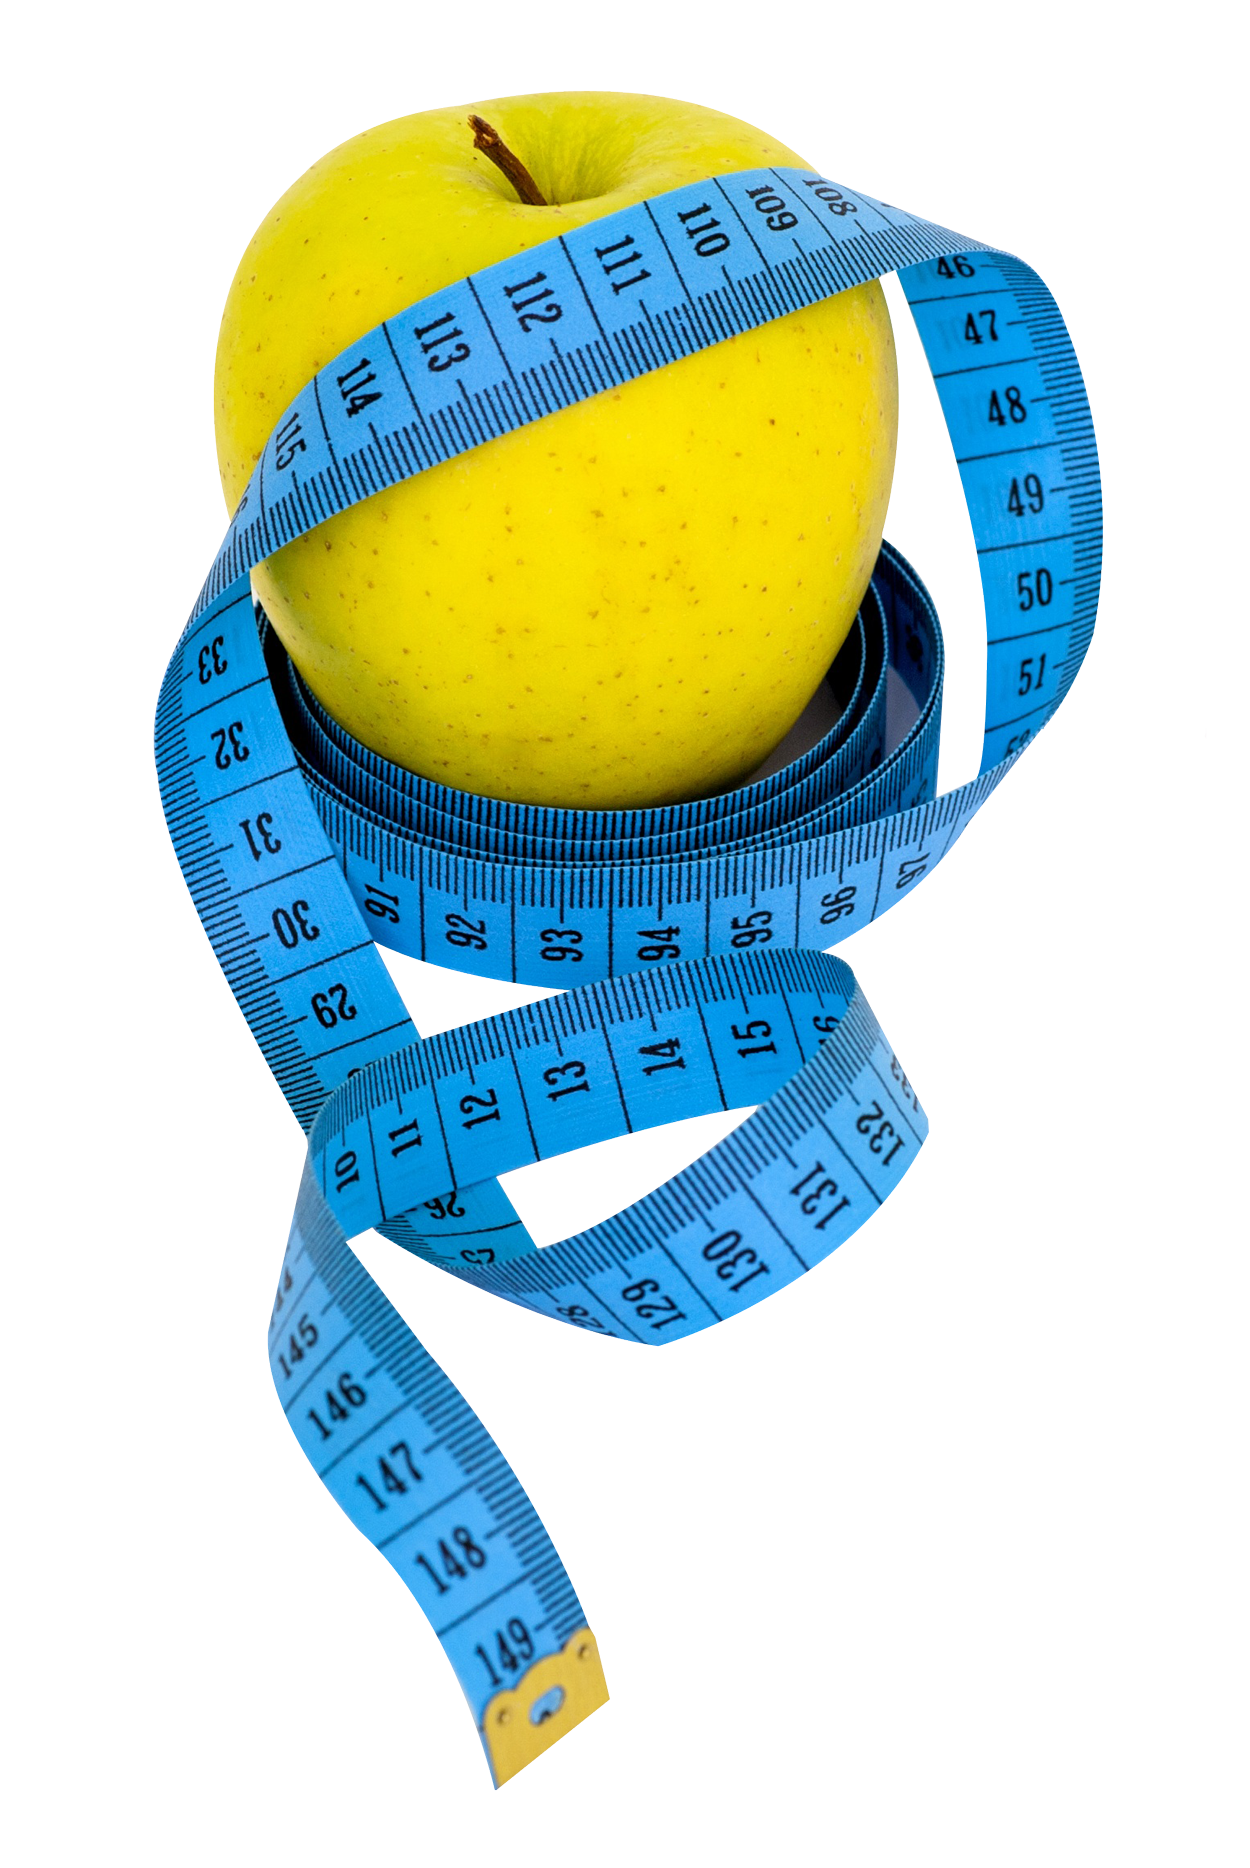 Apple Measure Tape PNG Image